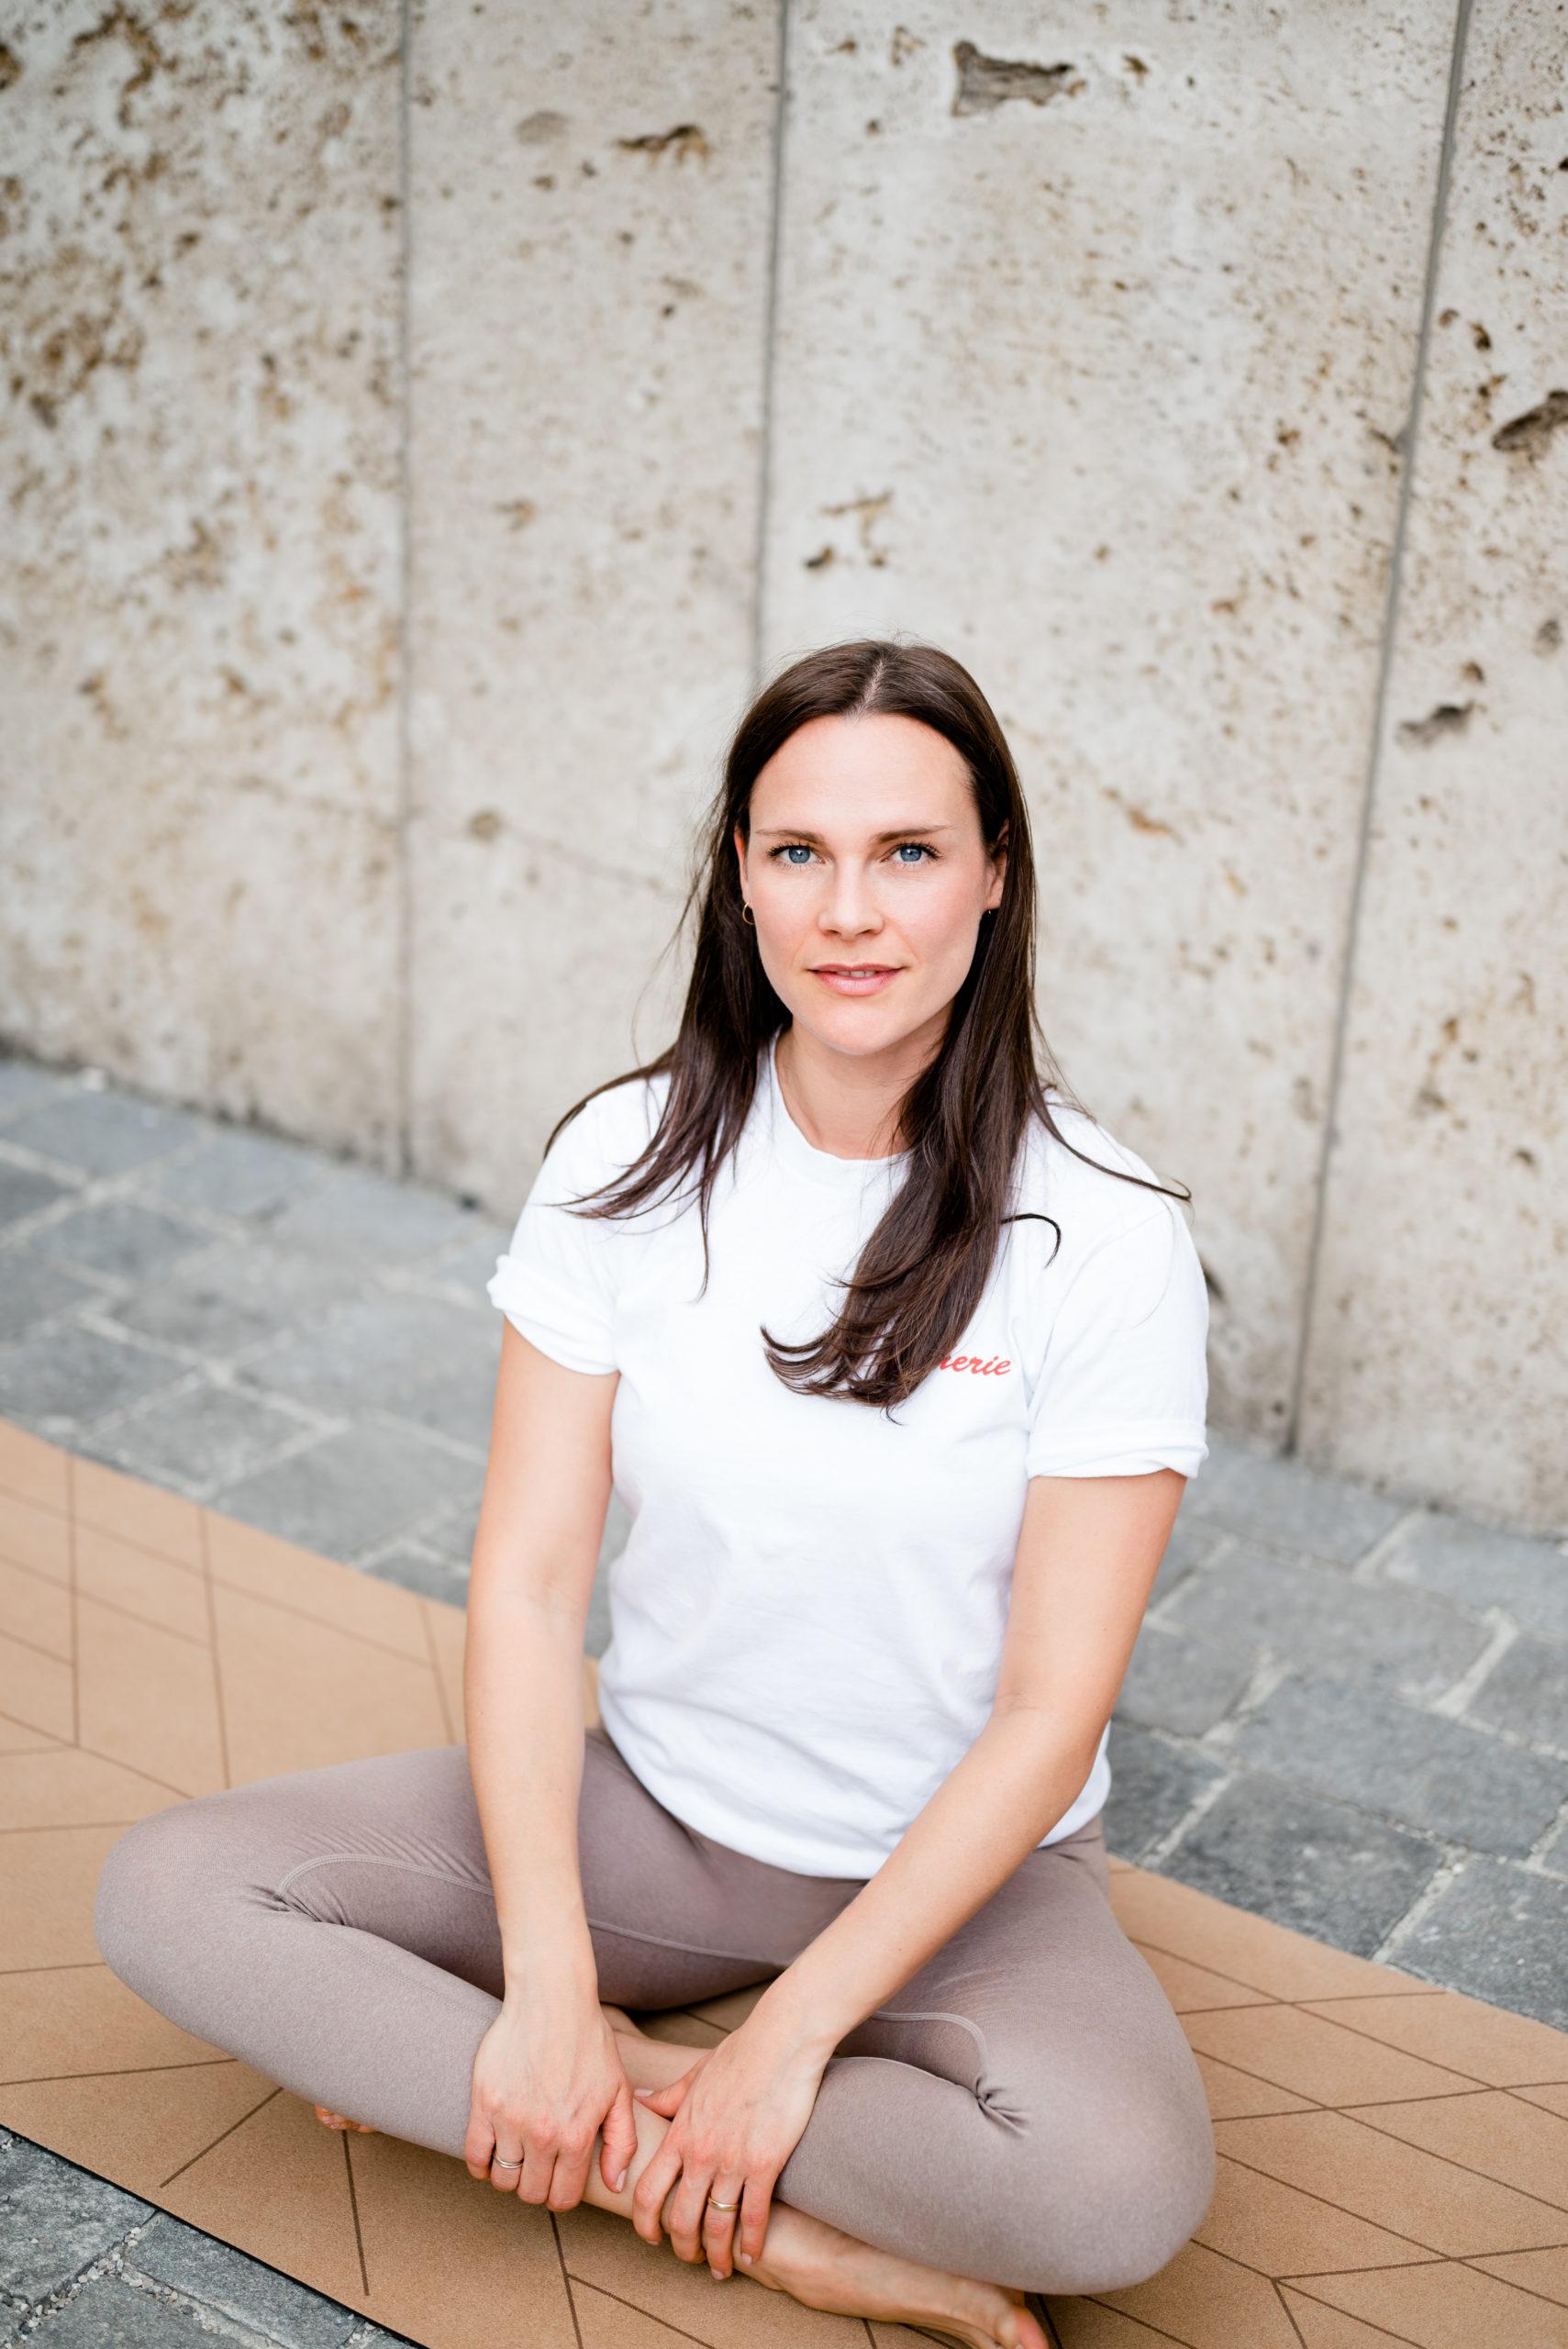 Linda-Kuhlmann-womaninmotion